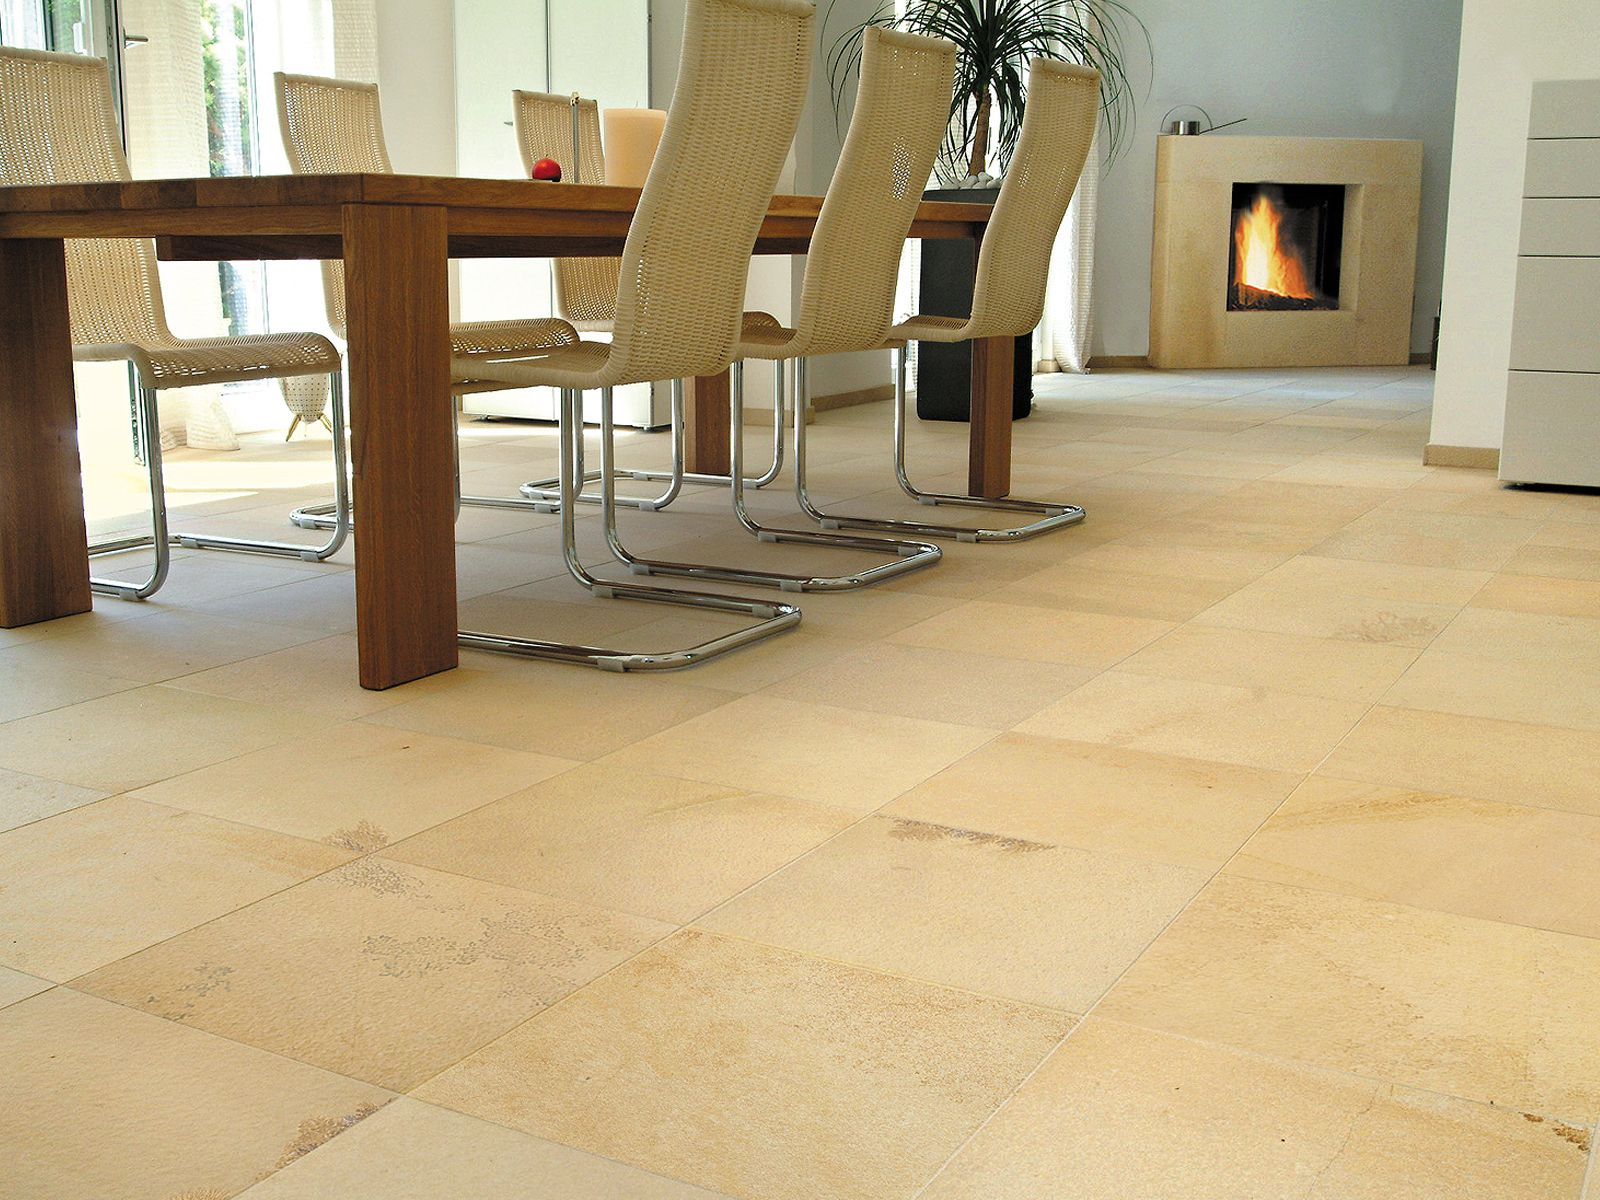 piedra natural solnhofen fsil para suelo en baldosa rectangular